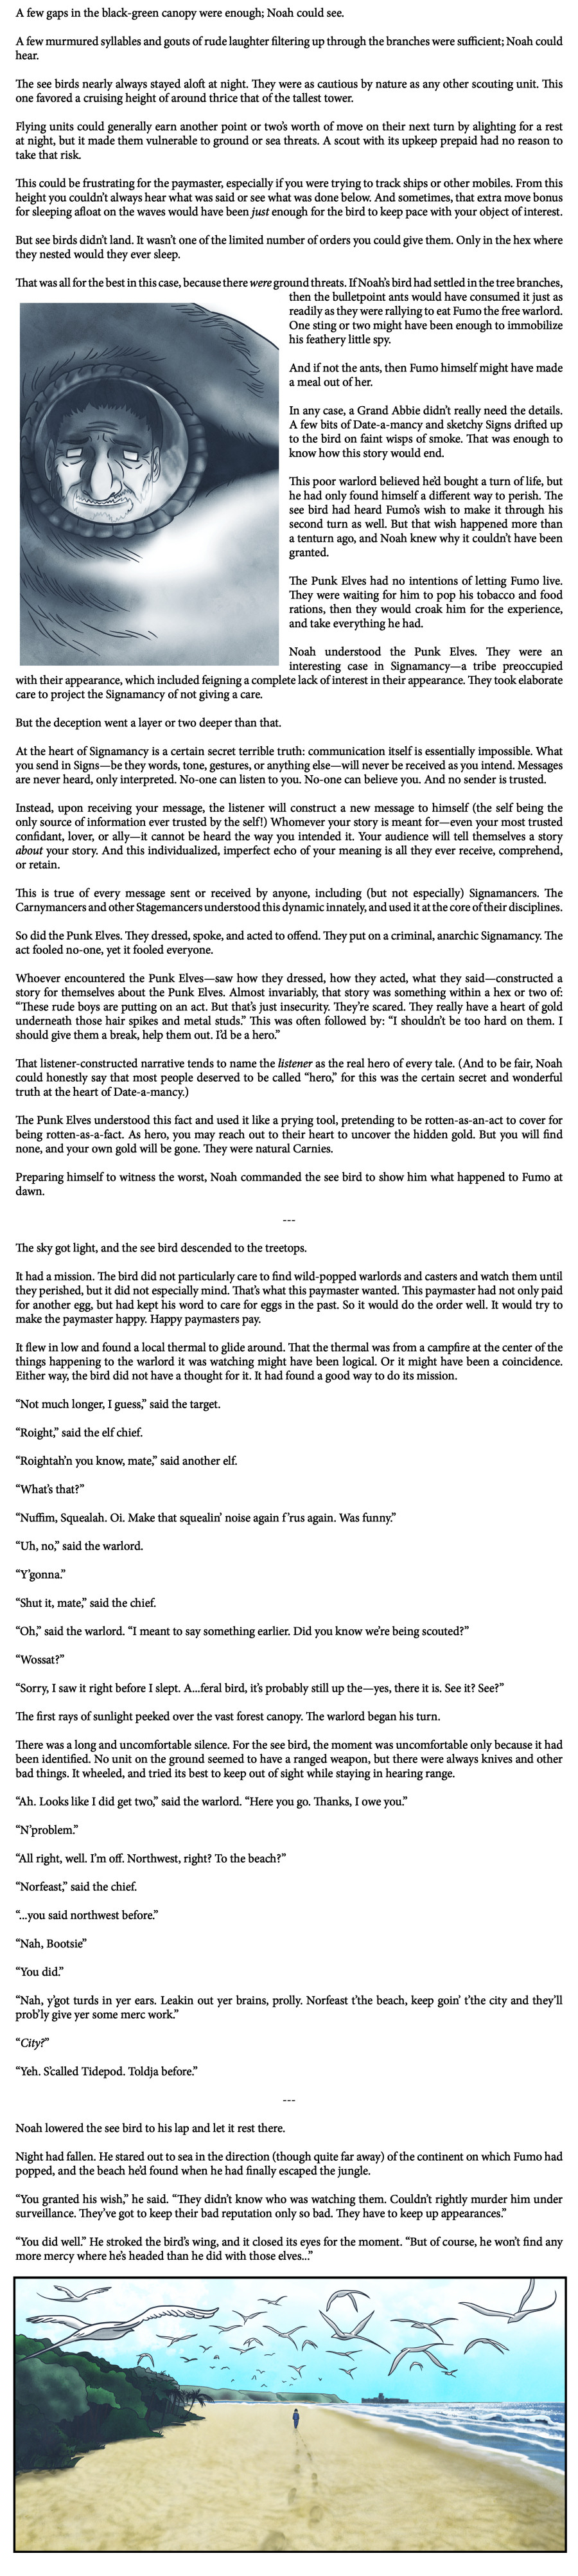 Comic - Book 5 - Page 4